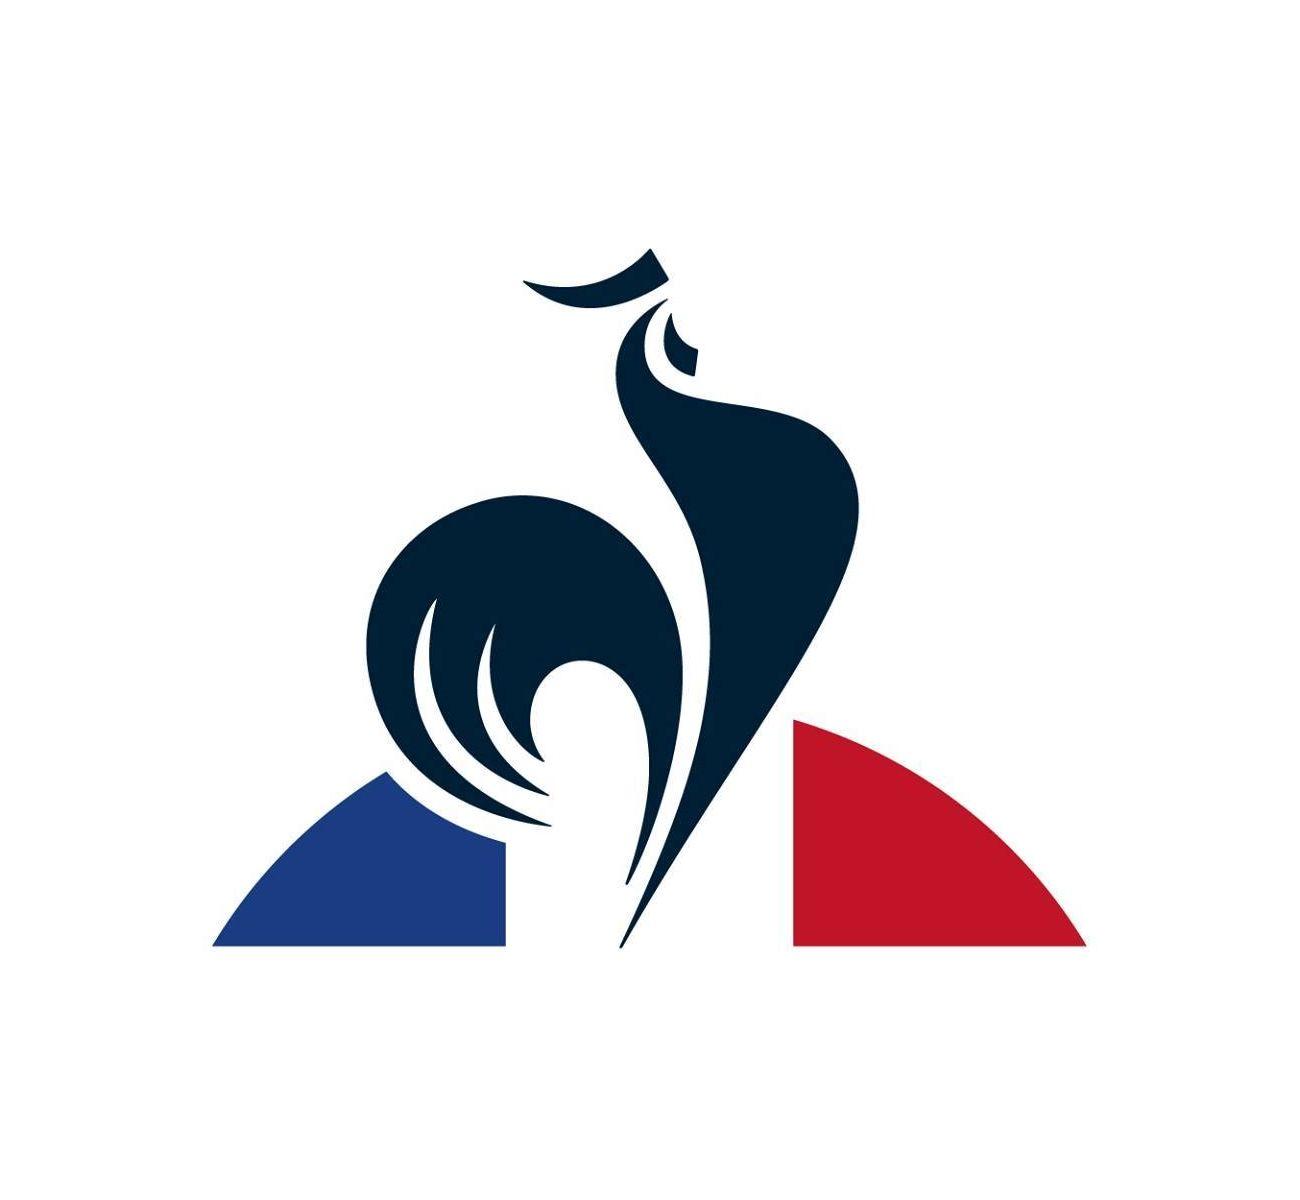 Le Coq Sportif Logo Recherche Carte De Visite Logos D